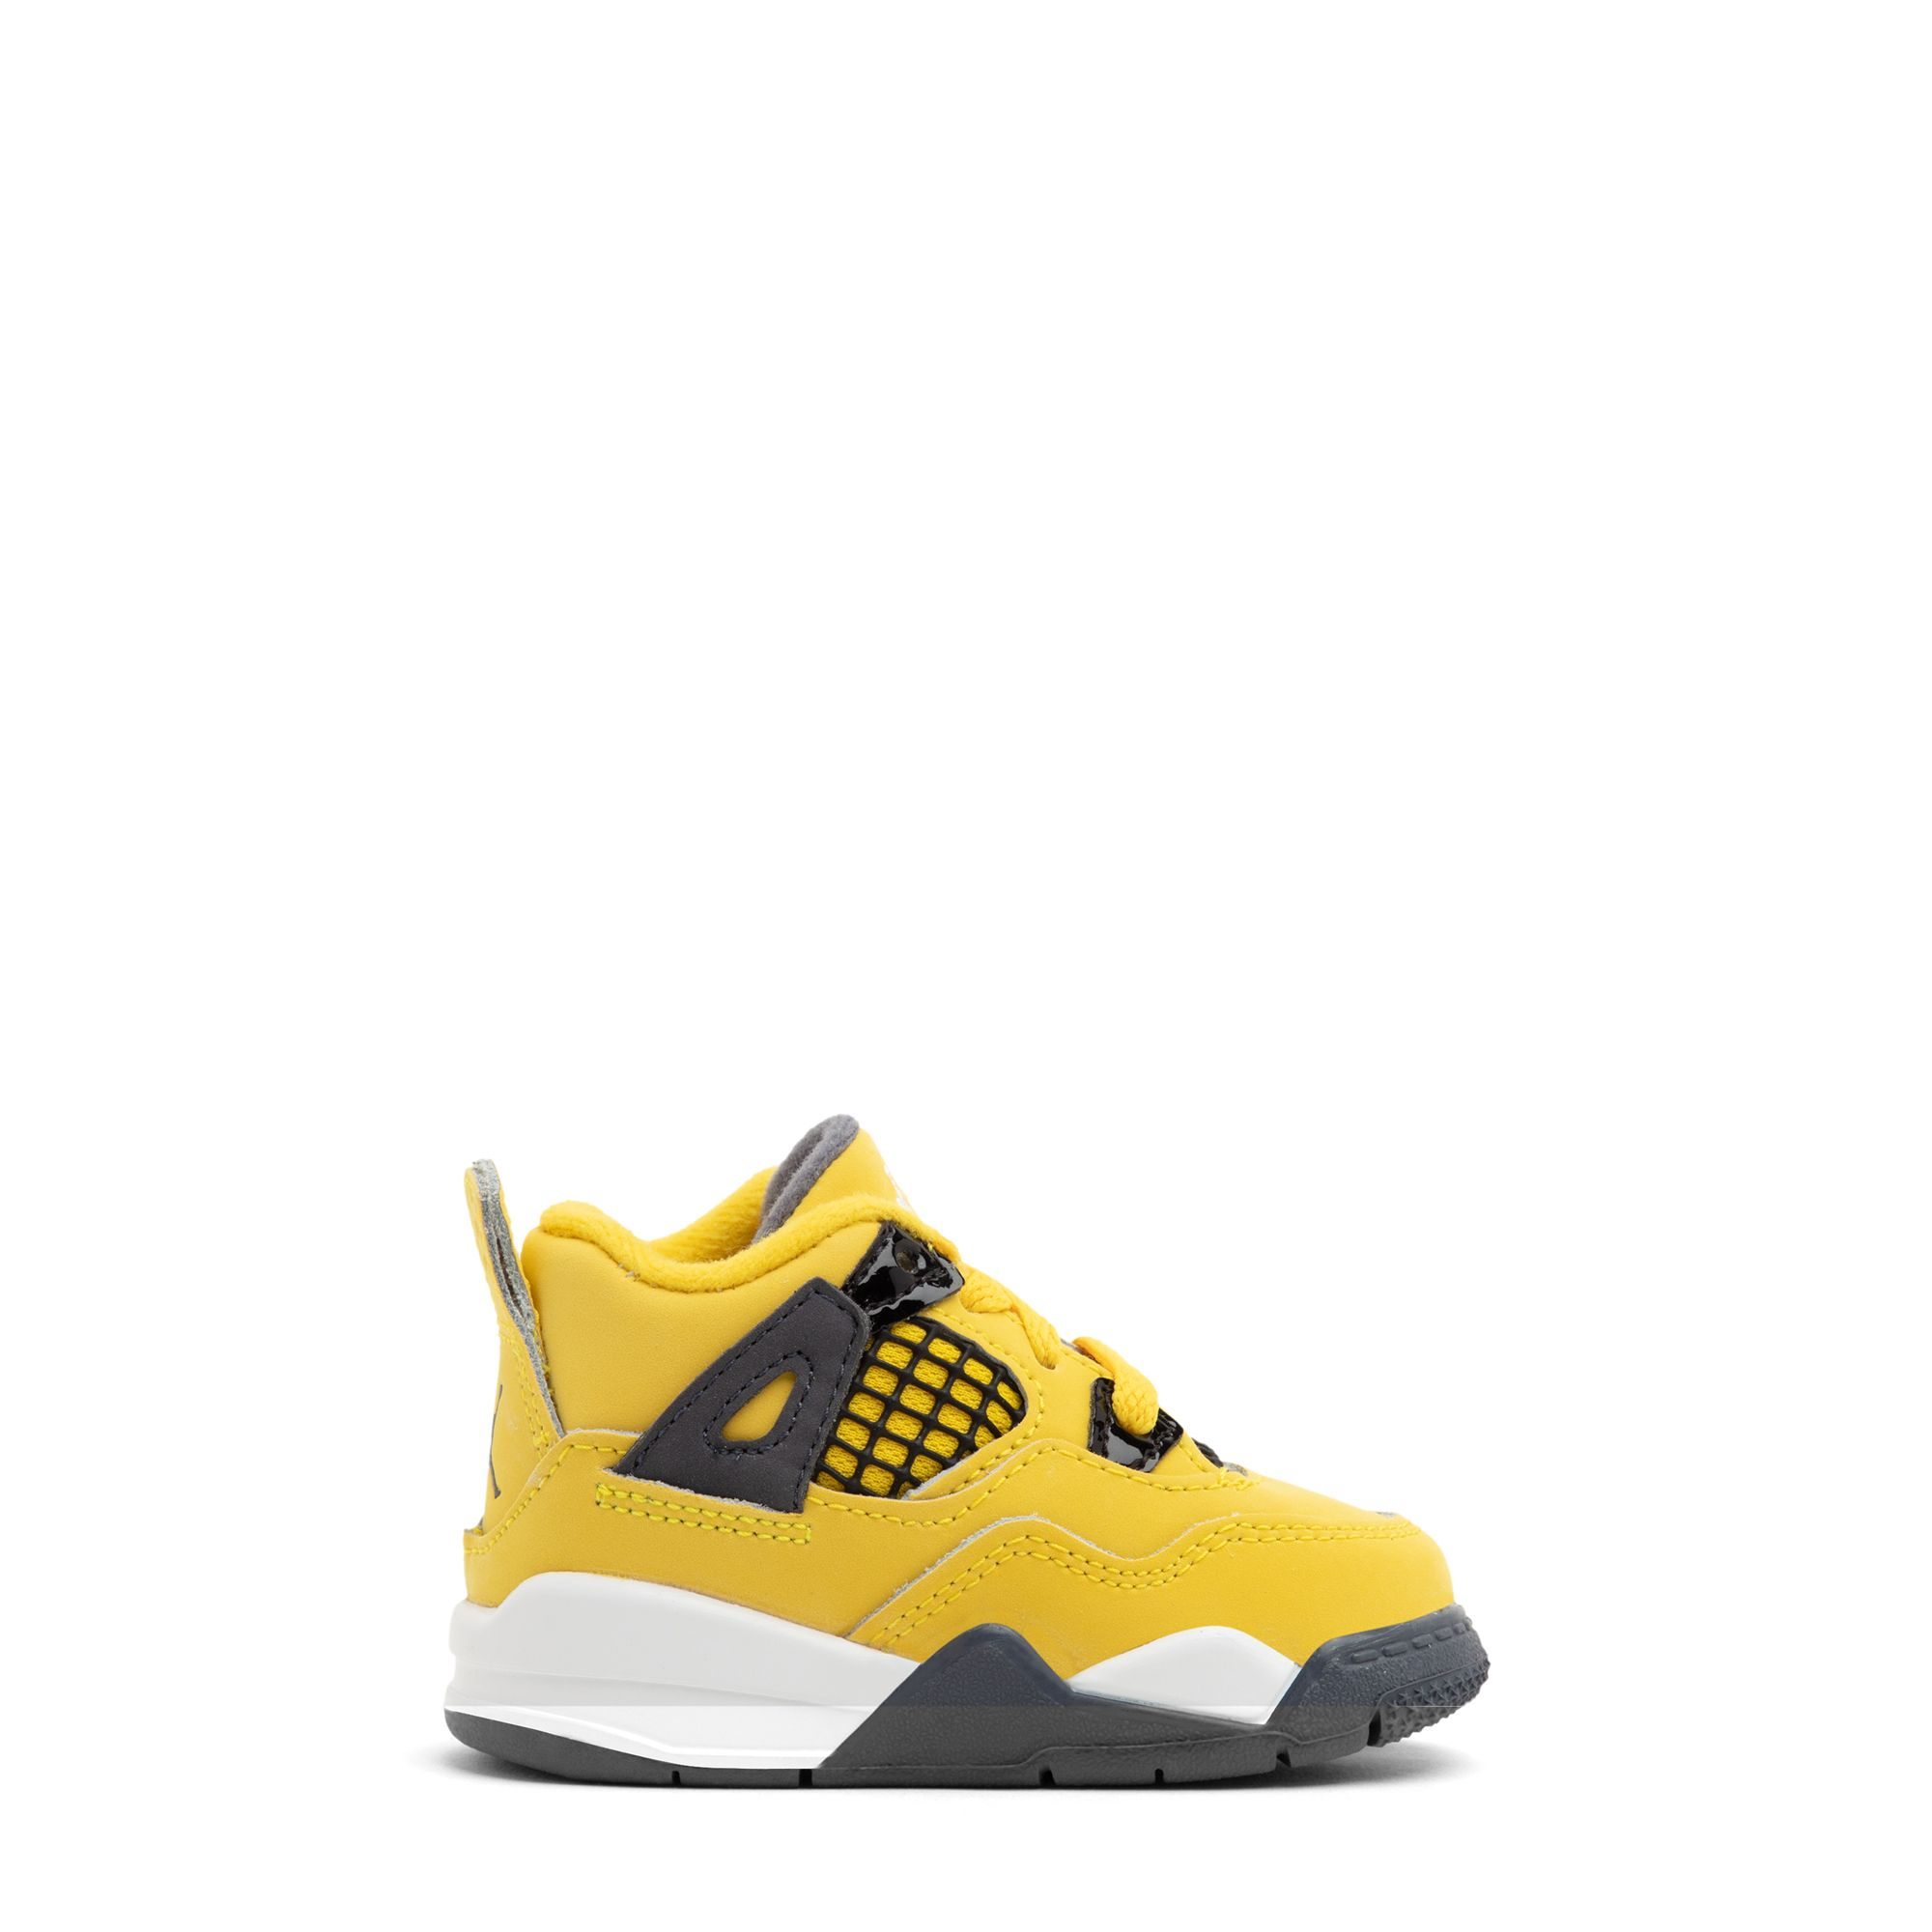 "Air Jordan 4 Retro ""Lightning"" sneakers"